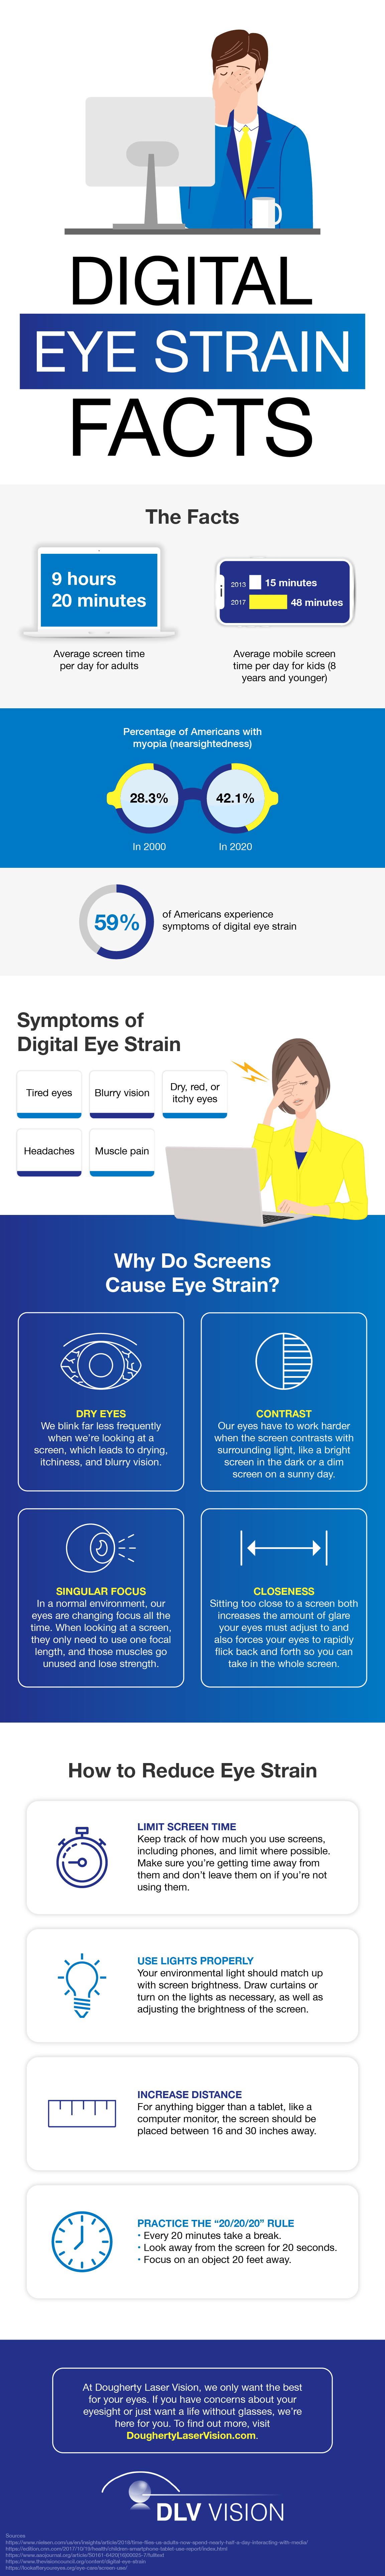 digital eye strain facts infographic